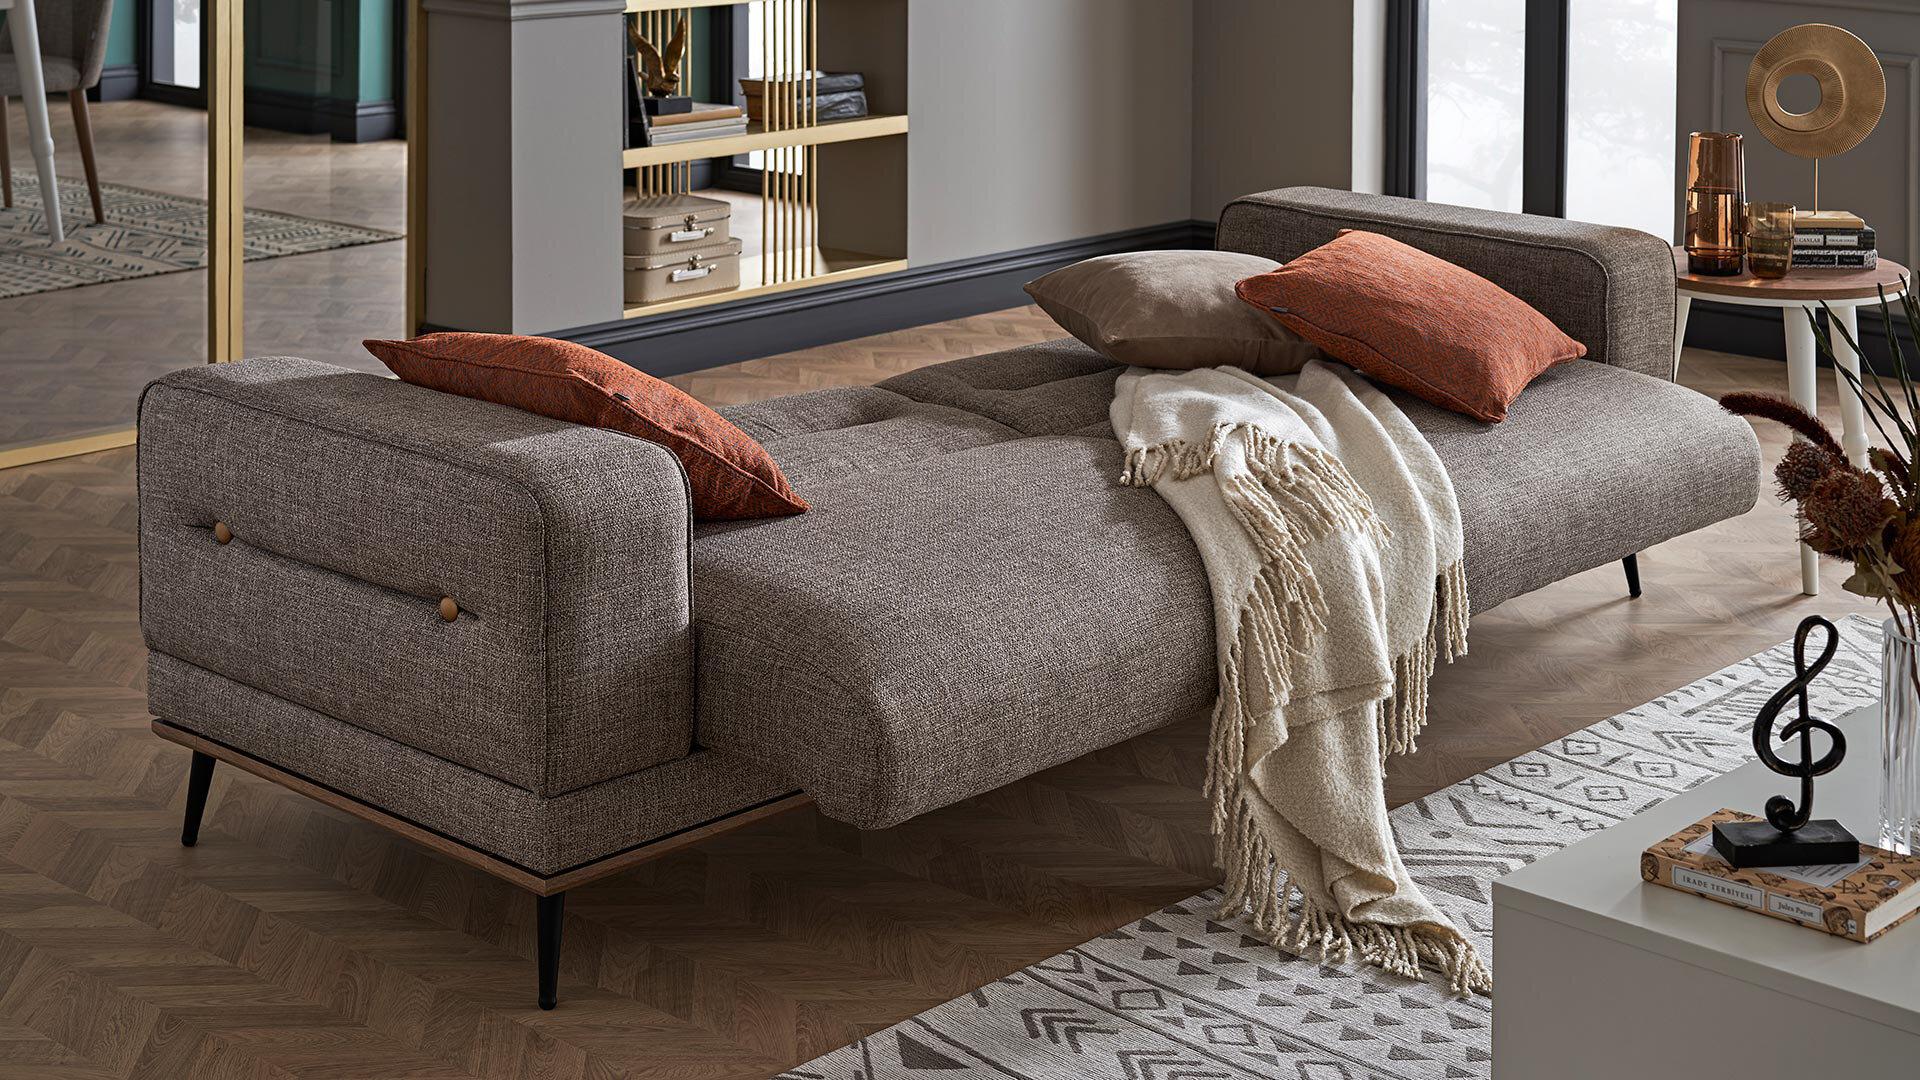 Larina 2 Seater Sofa Bed